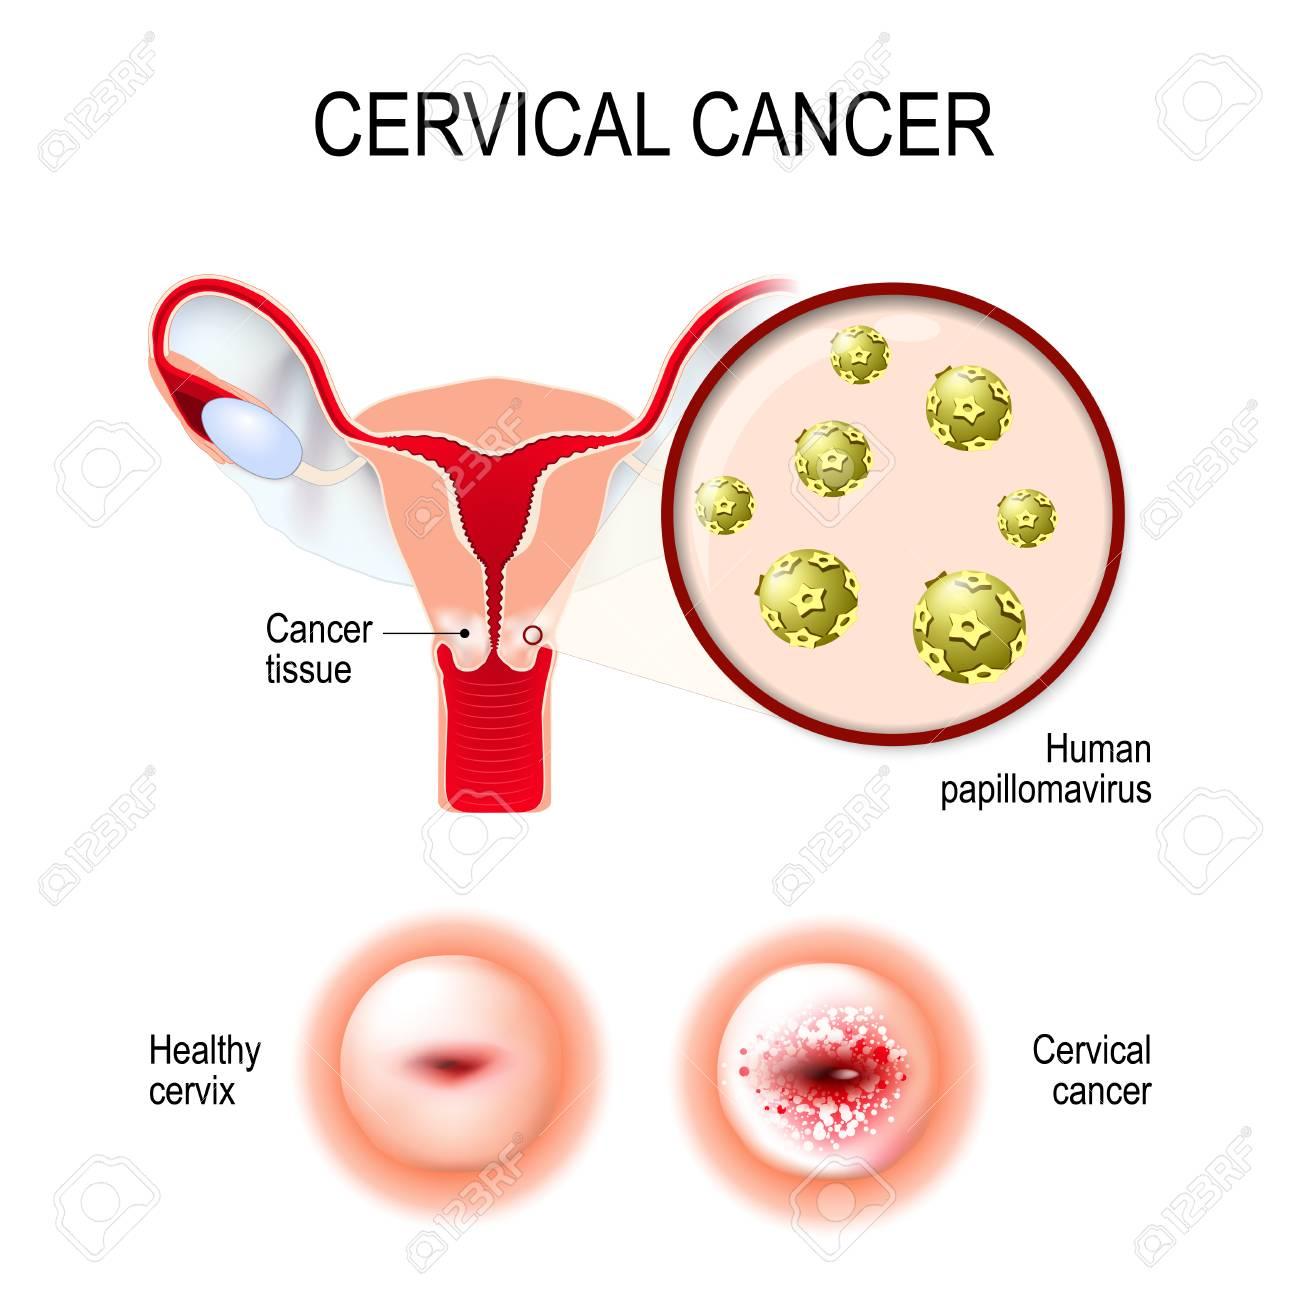 human papillomavirus infection for cervical cancer